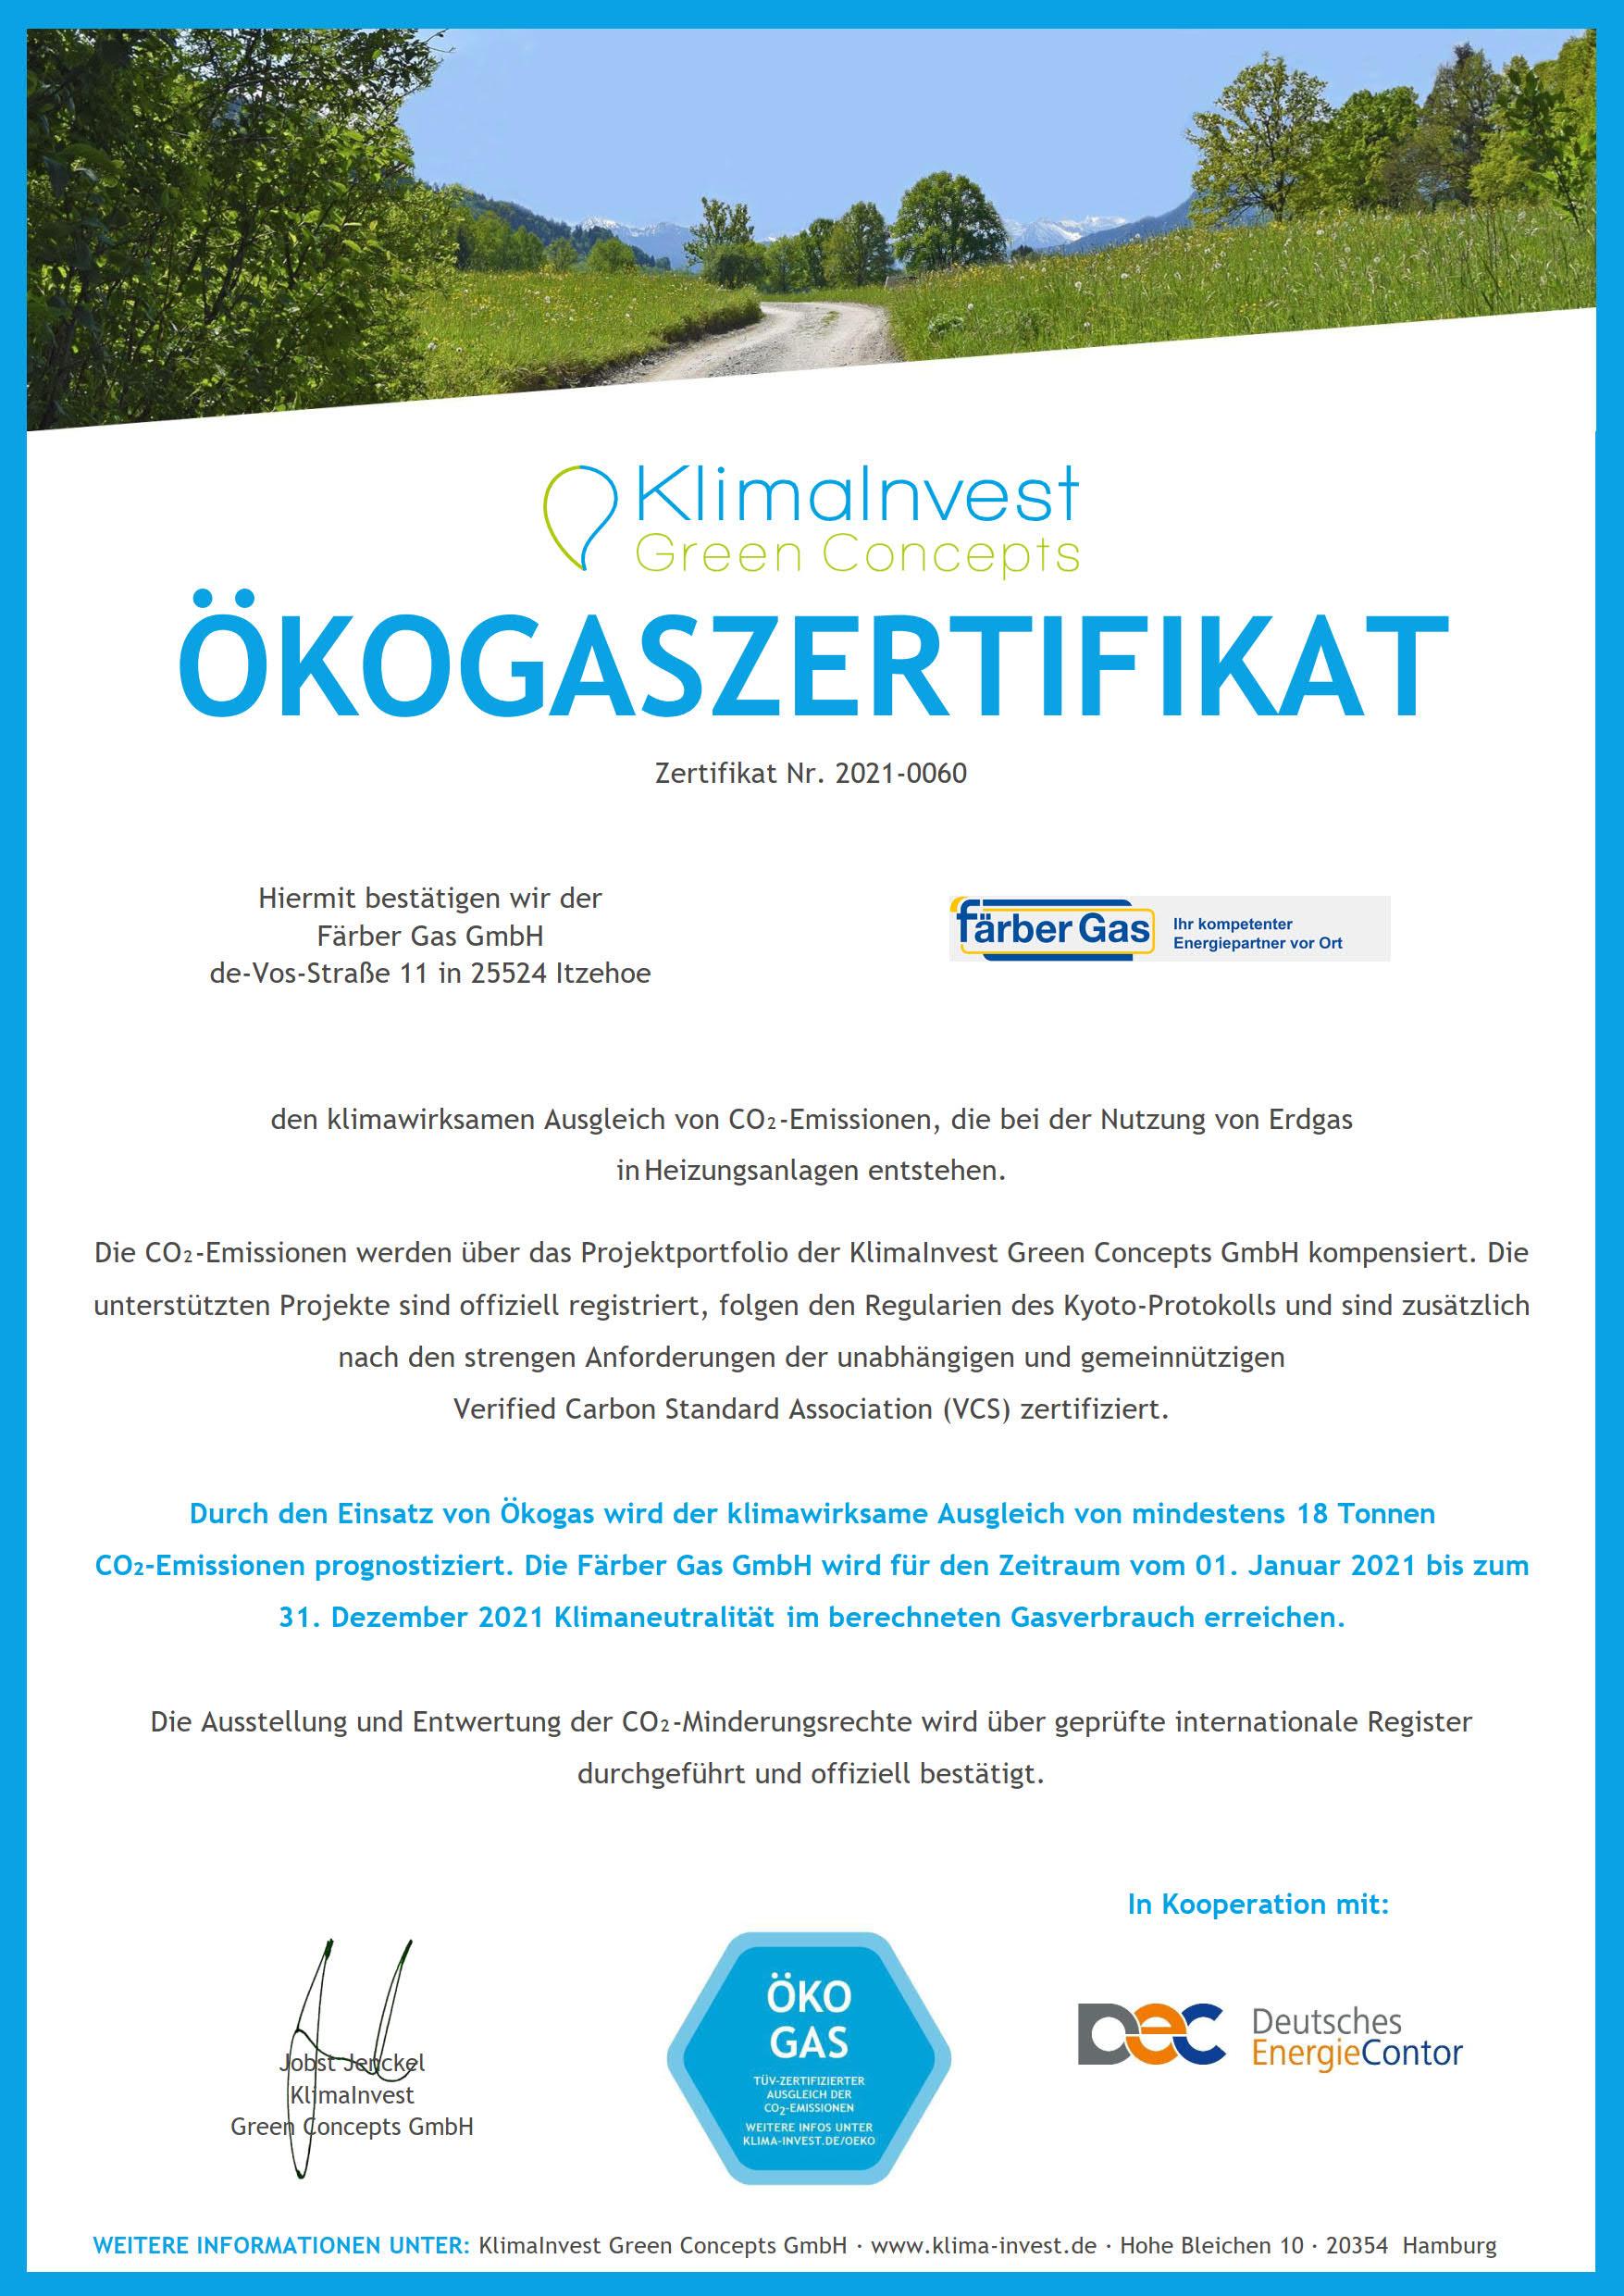 Färber Gas Erdgas klimaneutral Ökogaszertifikat